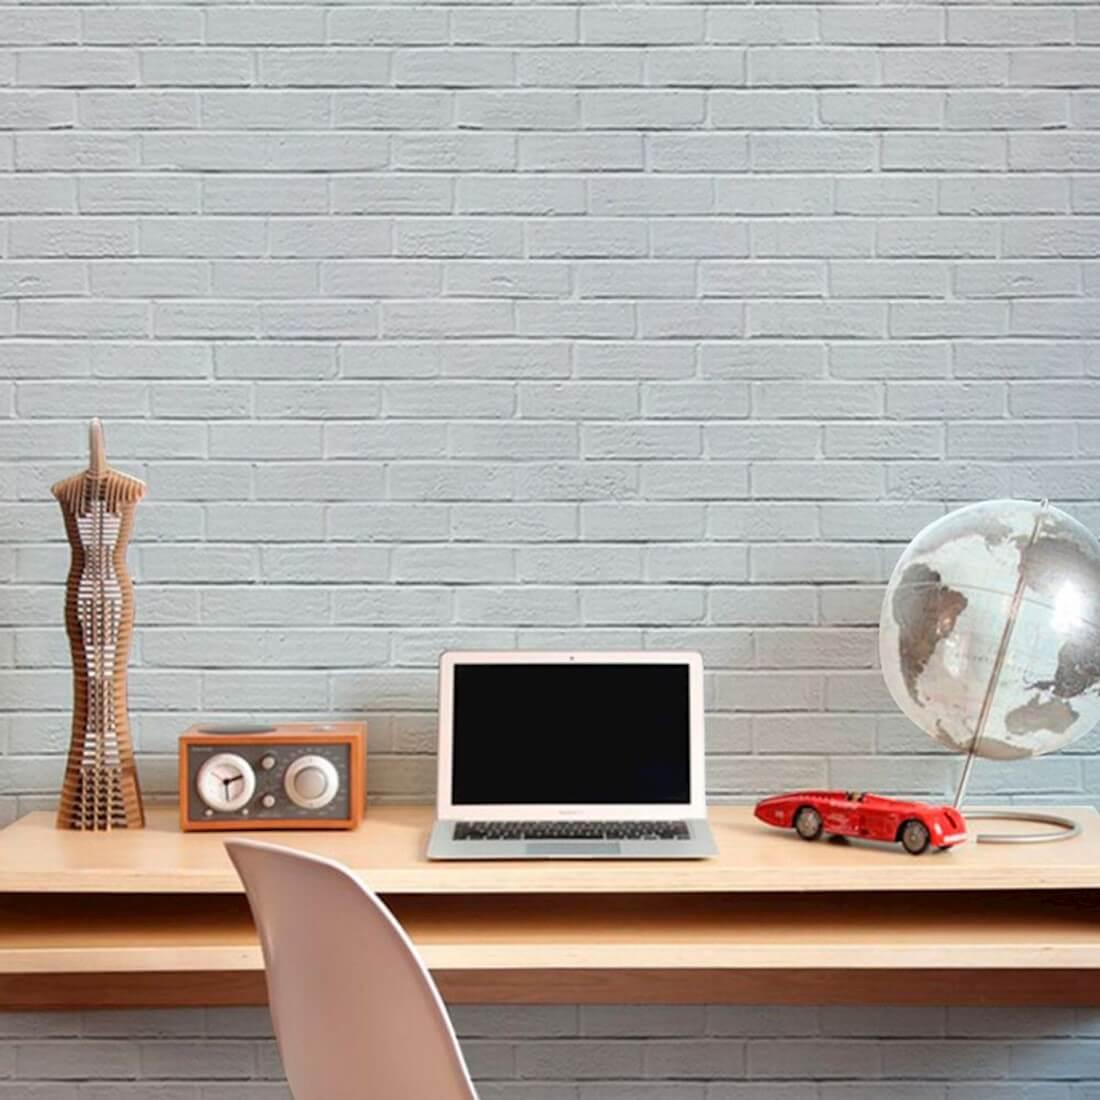 papel-de-parede-texturizado-dicas-para-escritorio